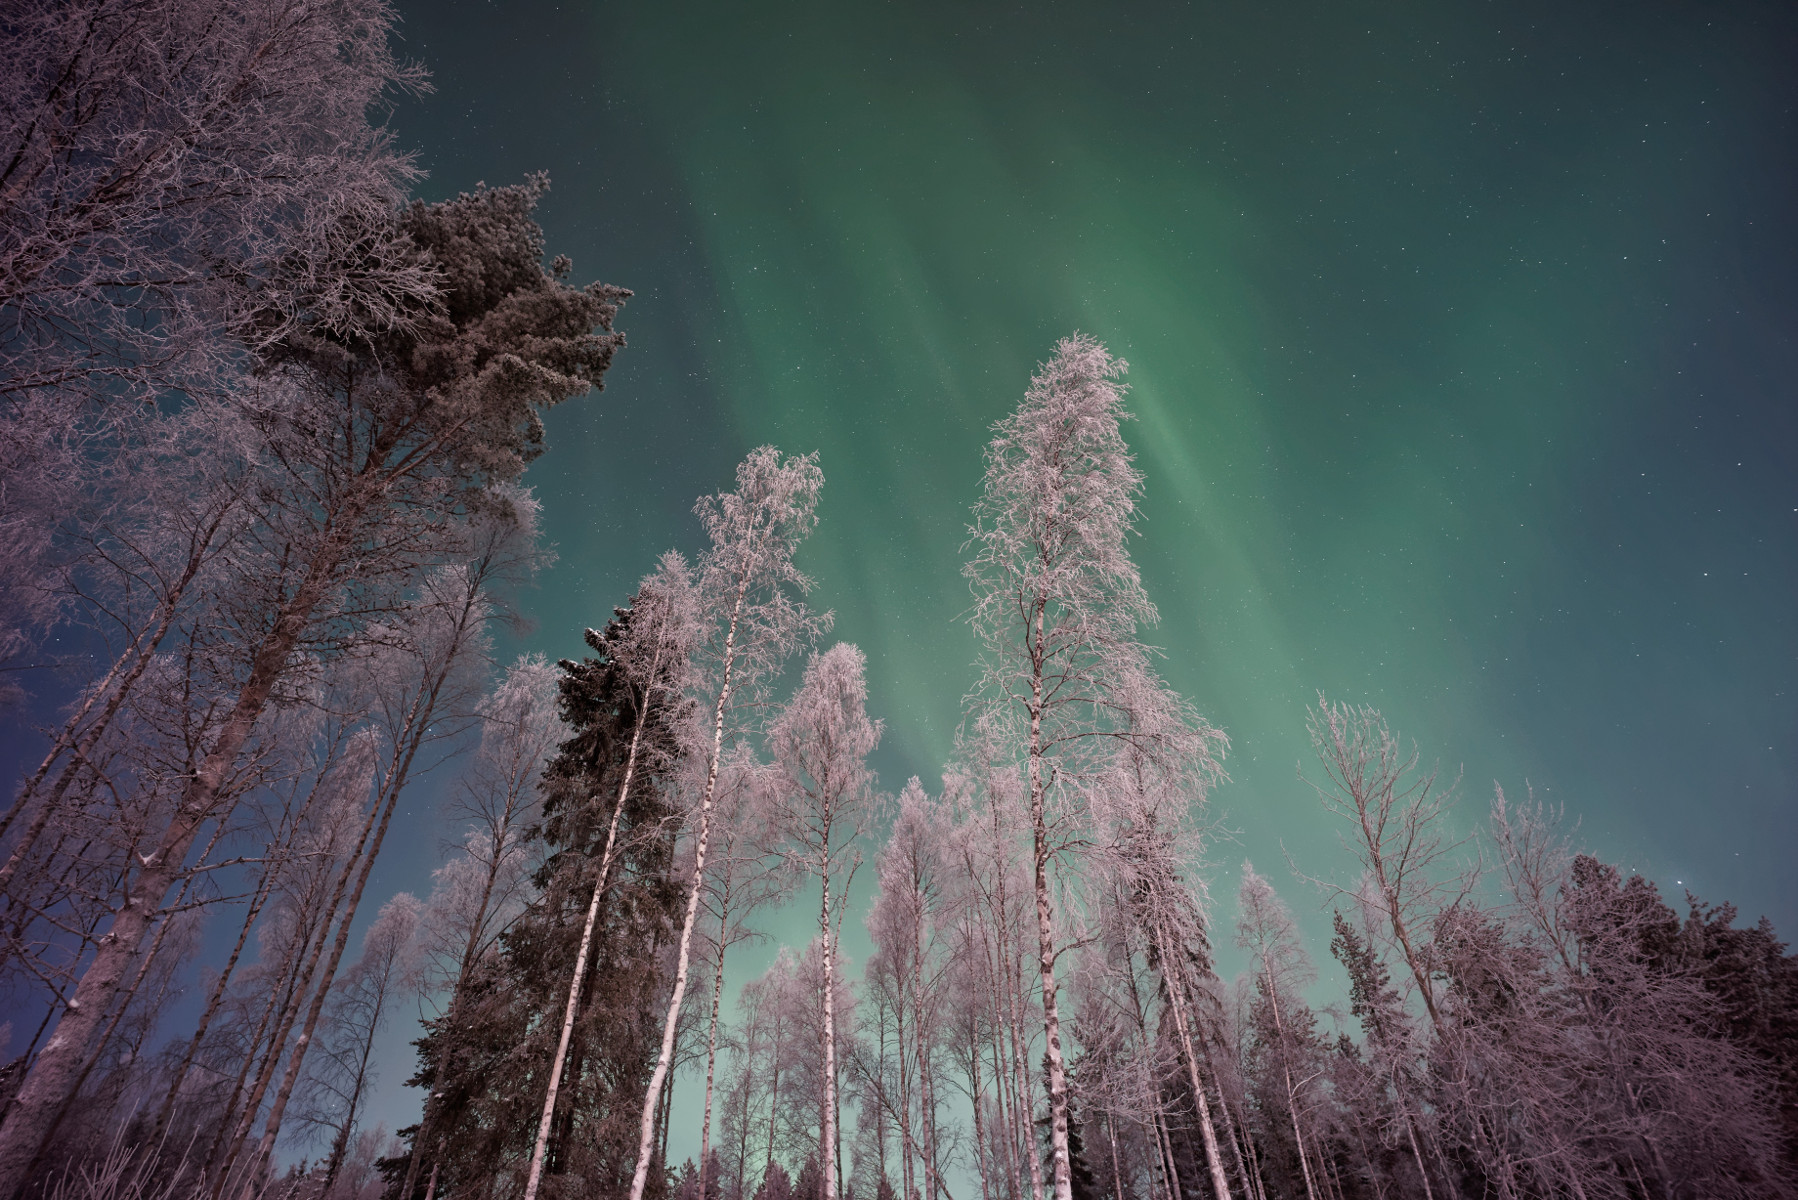 priv/static/static/aurora_borealis.jpg